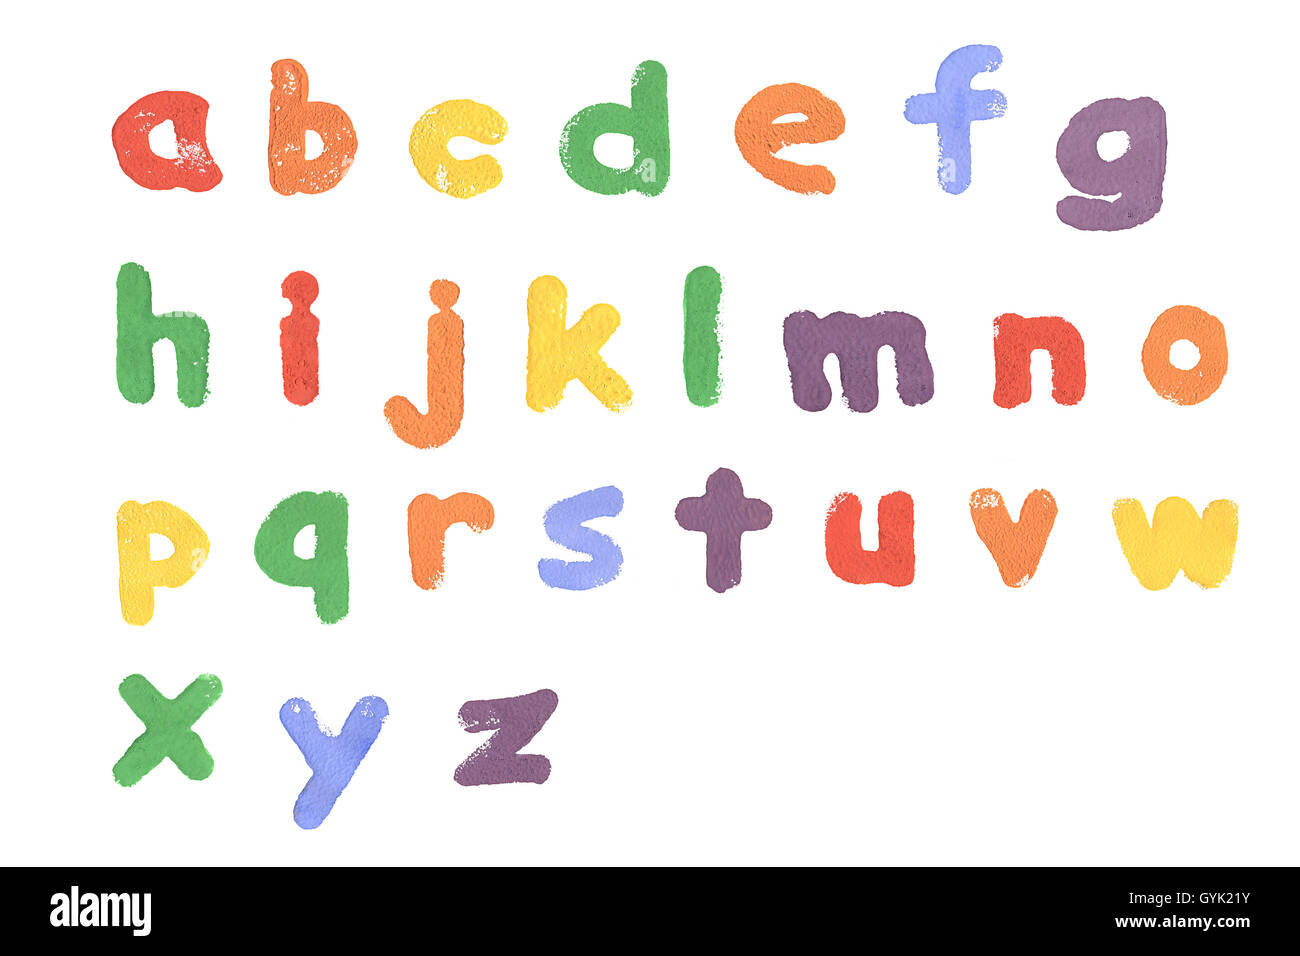 A sponge letter alphabet printed on white paper. - Stock Image